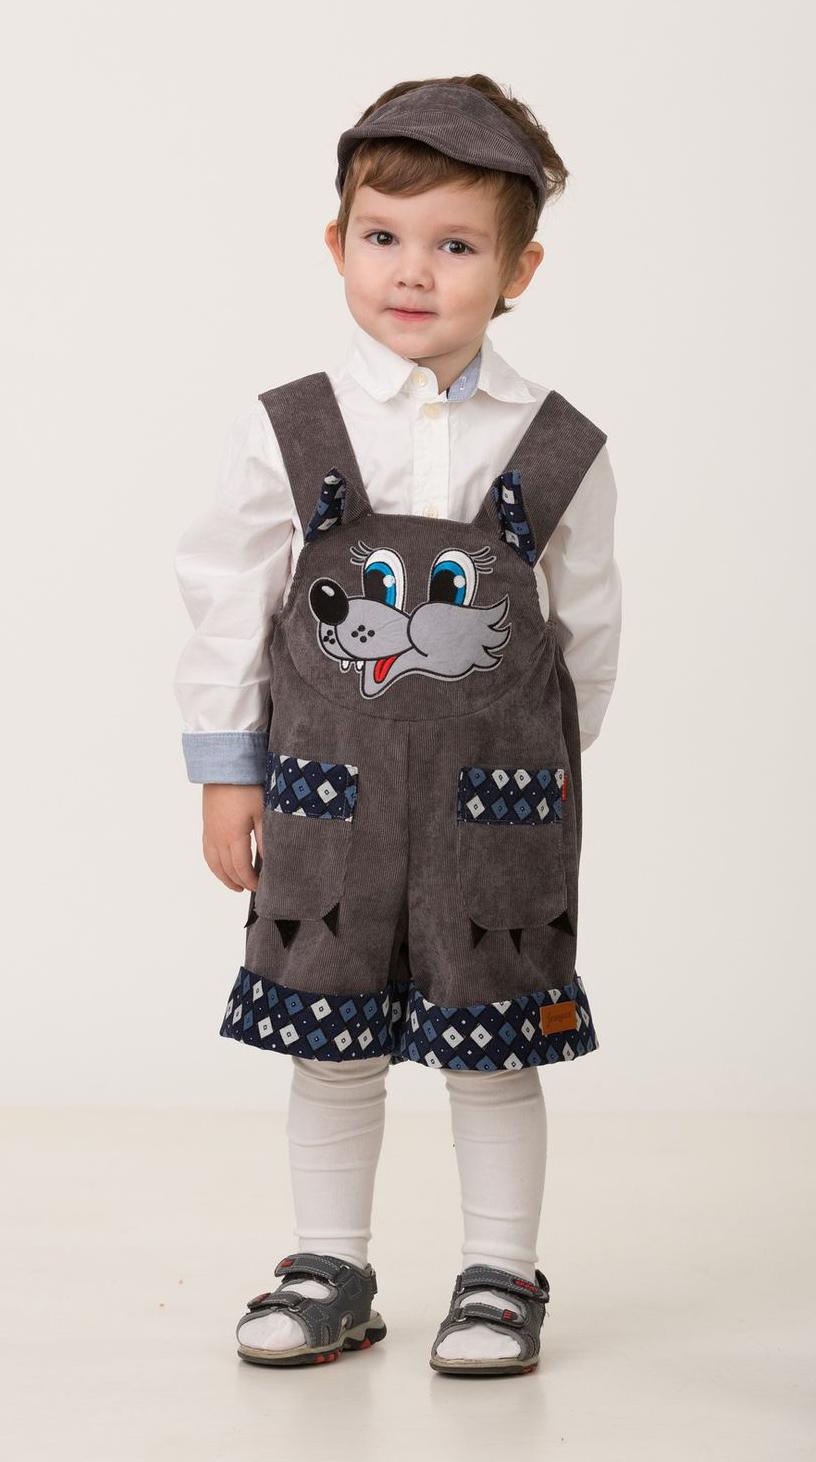 Карнавальный костюм Jeanees Волчонок Крепыш, цвет: тёмно-серый. Размер: 24 карнавальный костюм jeanees мышонок масик цвет серый размер 24